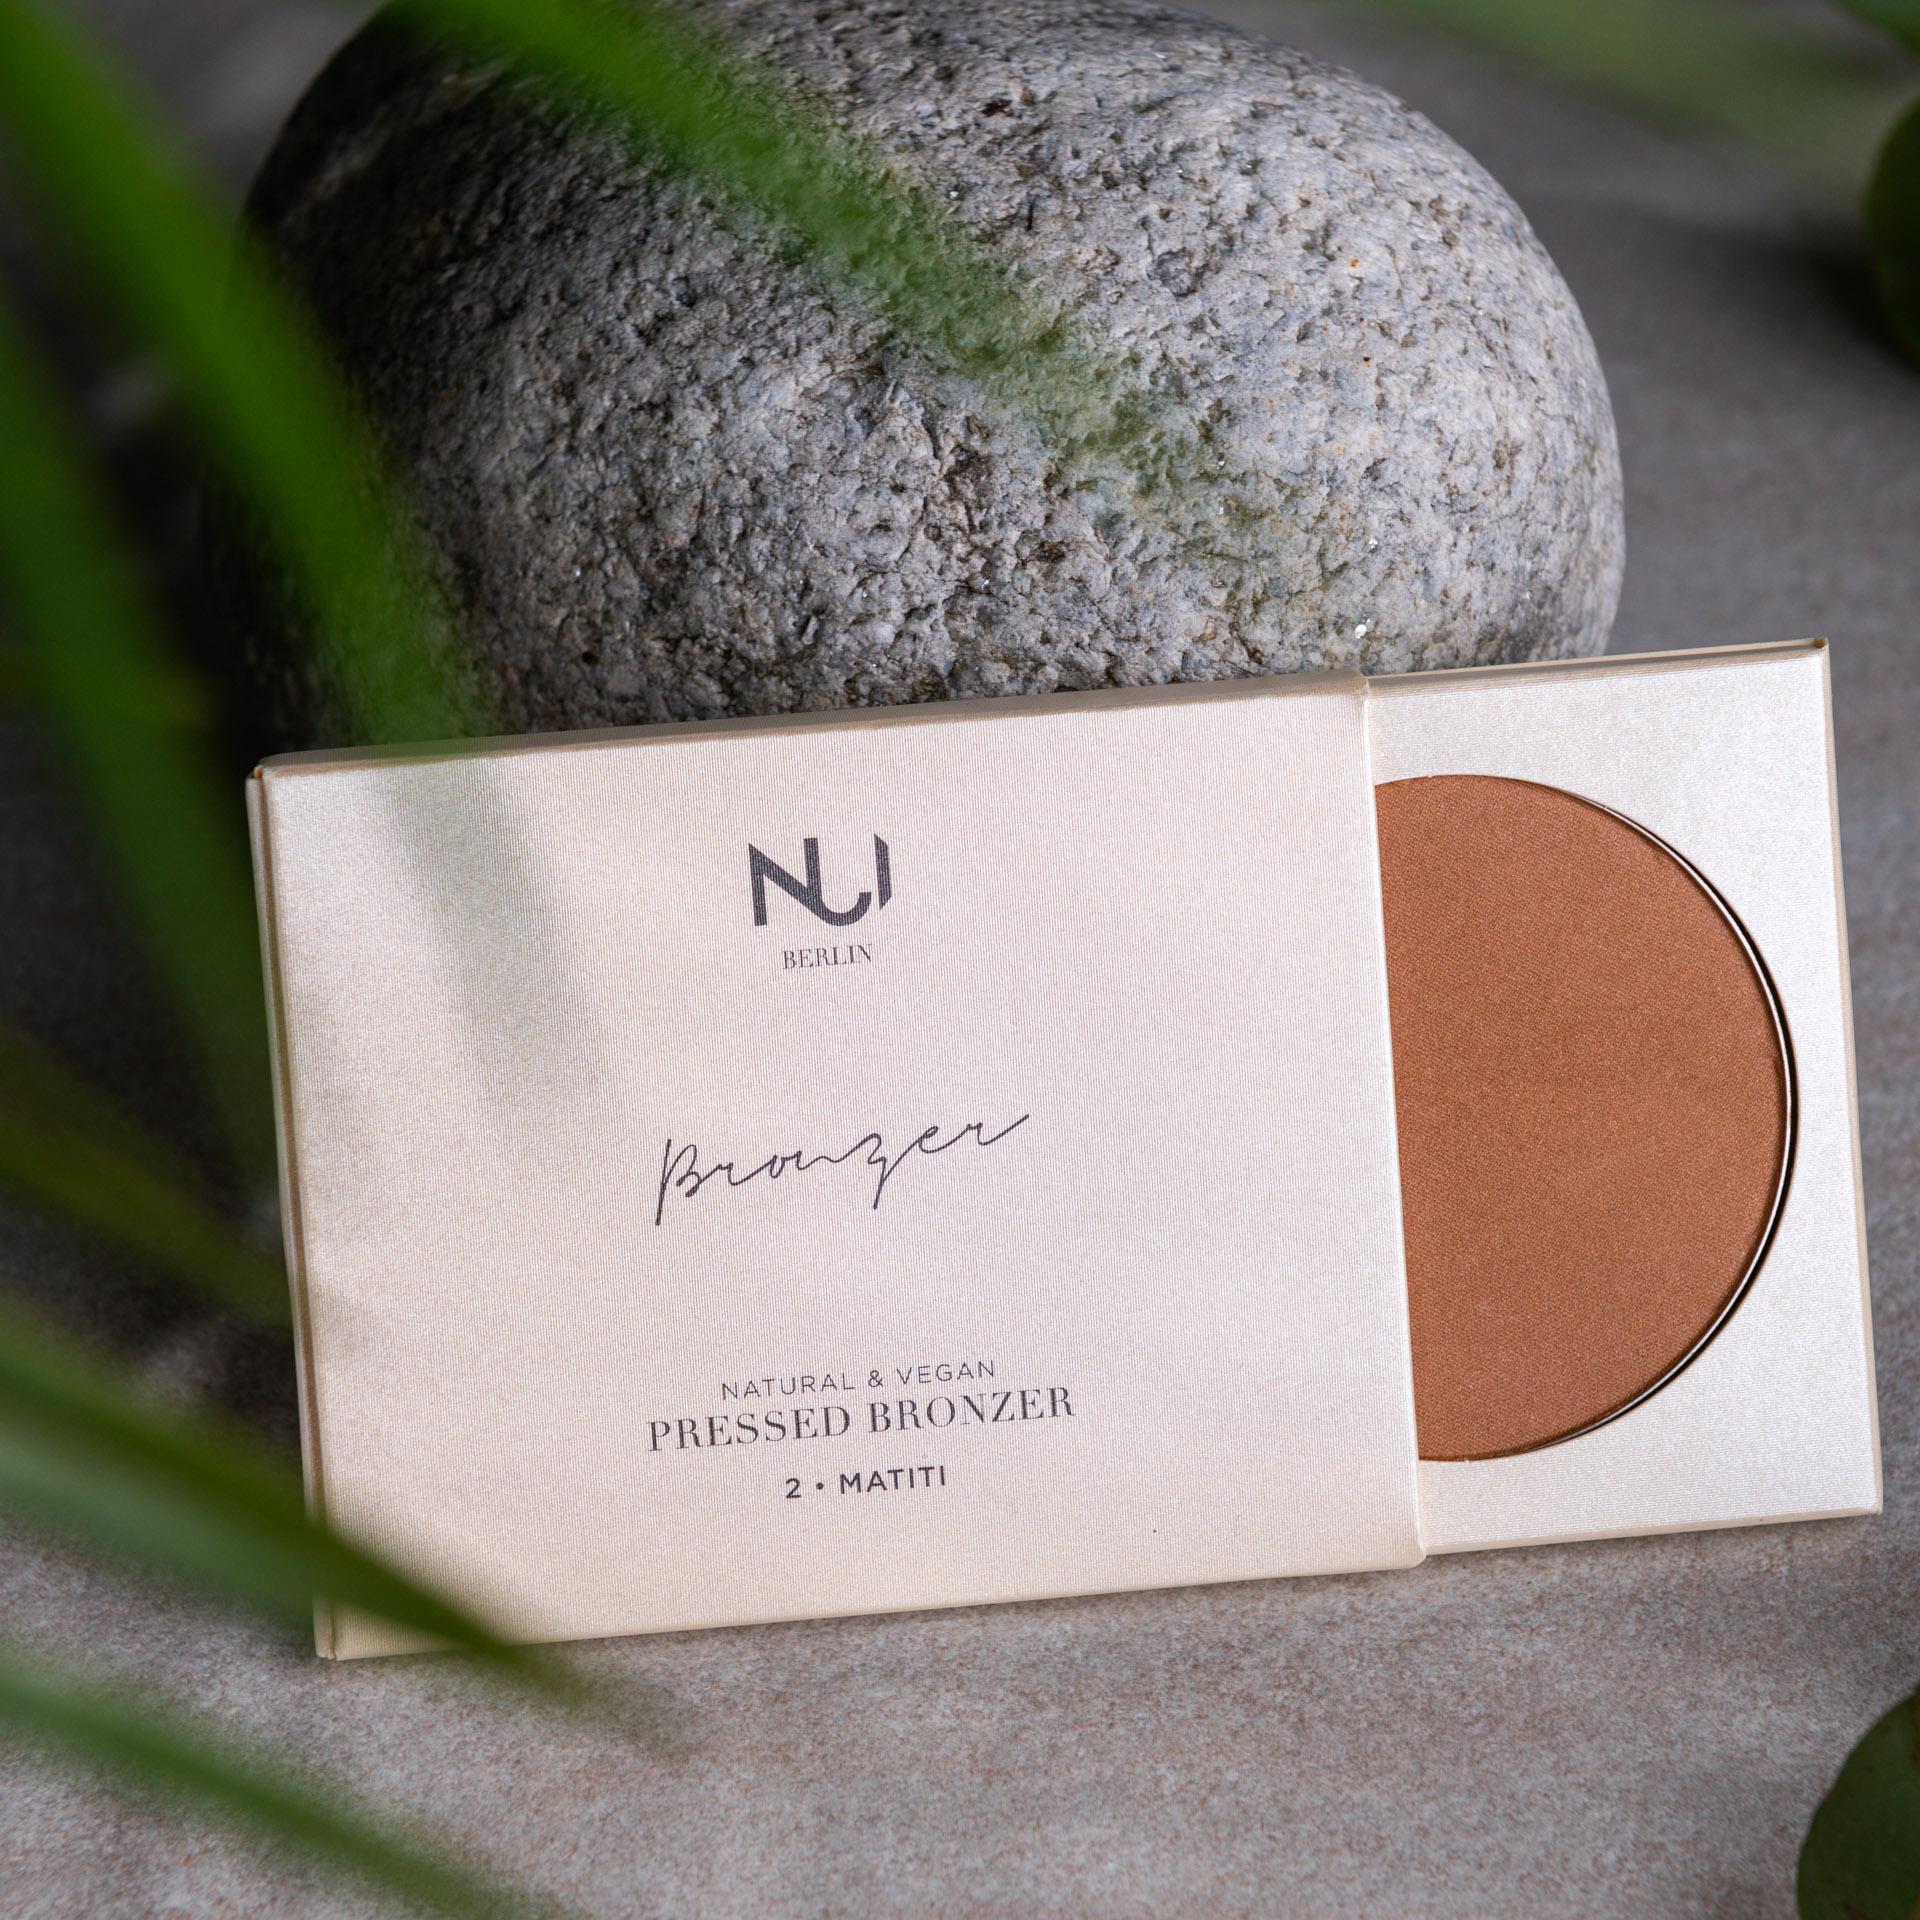 NUI Natural Pressed Bronzer MATITI